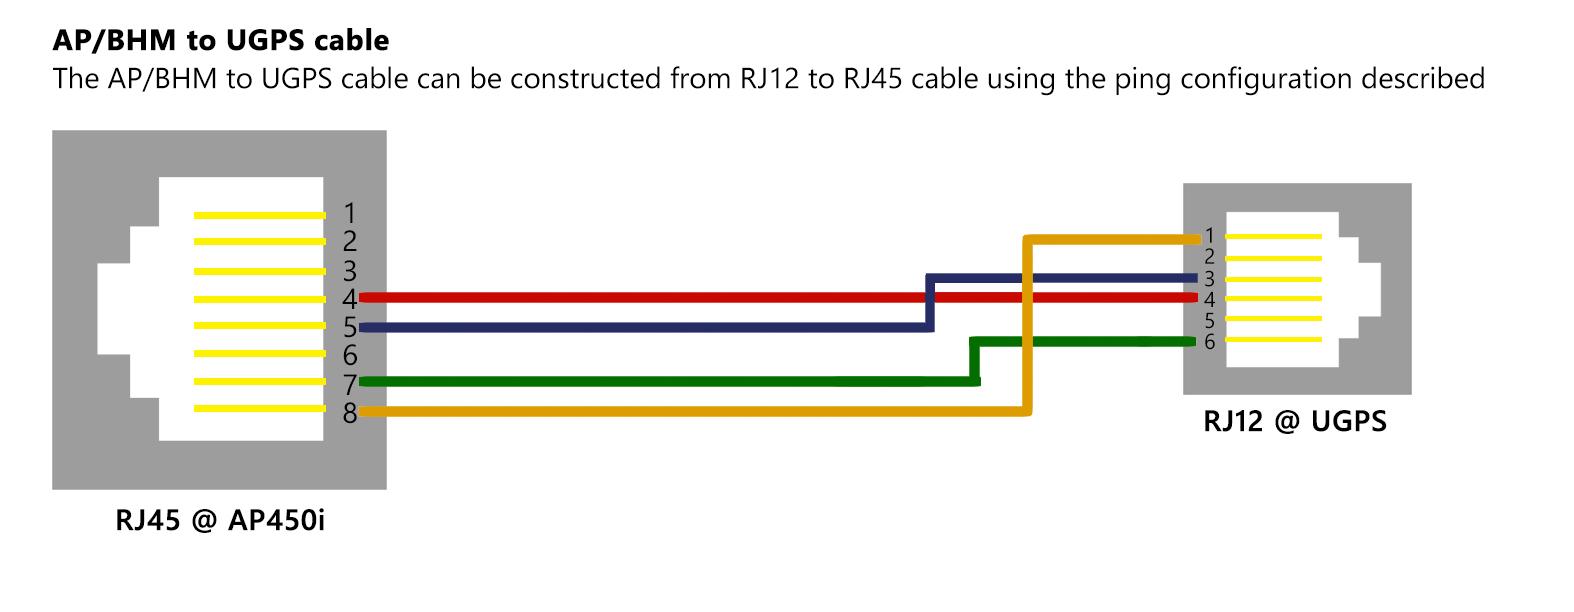 568a Wiring Rj11 - Wiring Diagram All on rs232 wiring diagram, rj45 pinout, power wiring diagram, wifi wiring diagram, rj11 wiring diagram, networking wiring diagram, usb wiring diagram, rj12 wiring diagram, telephone wiring diagram, cat5e jack diagram, cat5e wiring diagram, st wiring diagram, cat 6 wiring diagram, m12 wiring diagram, cat 5 wiring diagram, ethernet wiring diagram, rj45 connector, t568b wiring diagram, rj45 cable, utp wiring diagram,